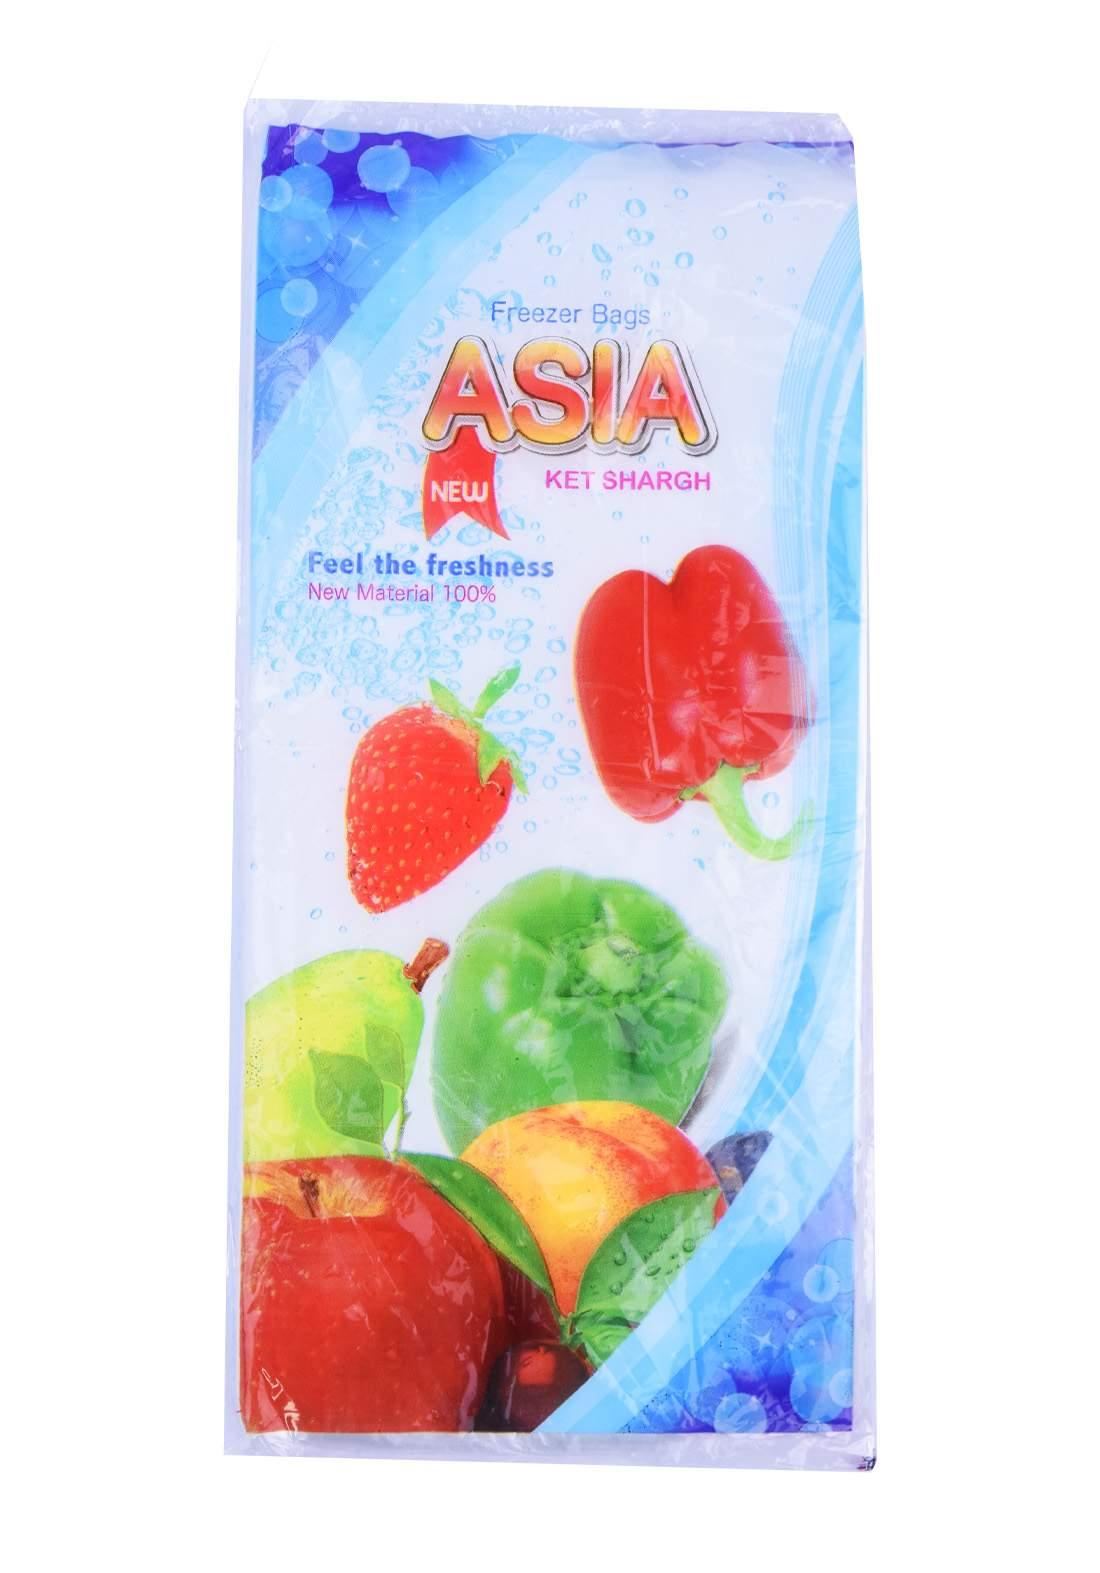 Asia Nylon Bags For Preserving Food اكياس نايلون لحفظ الاطعمة